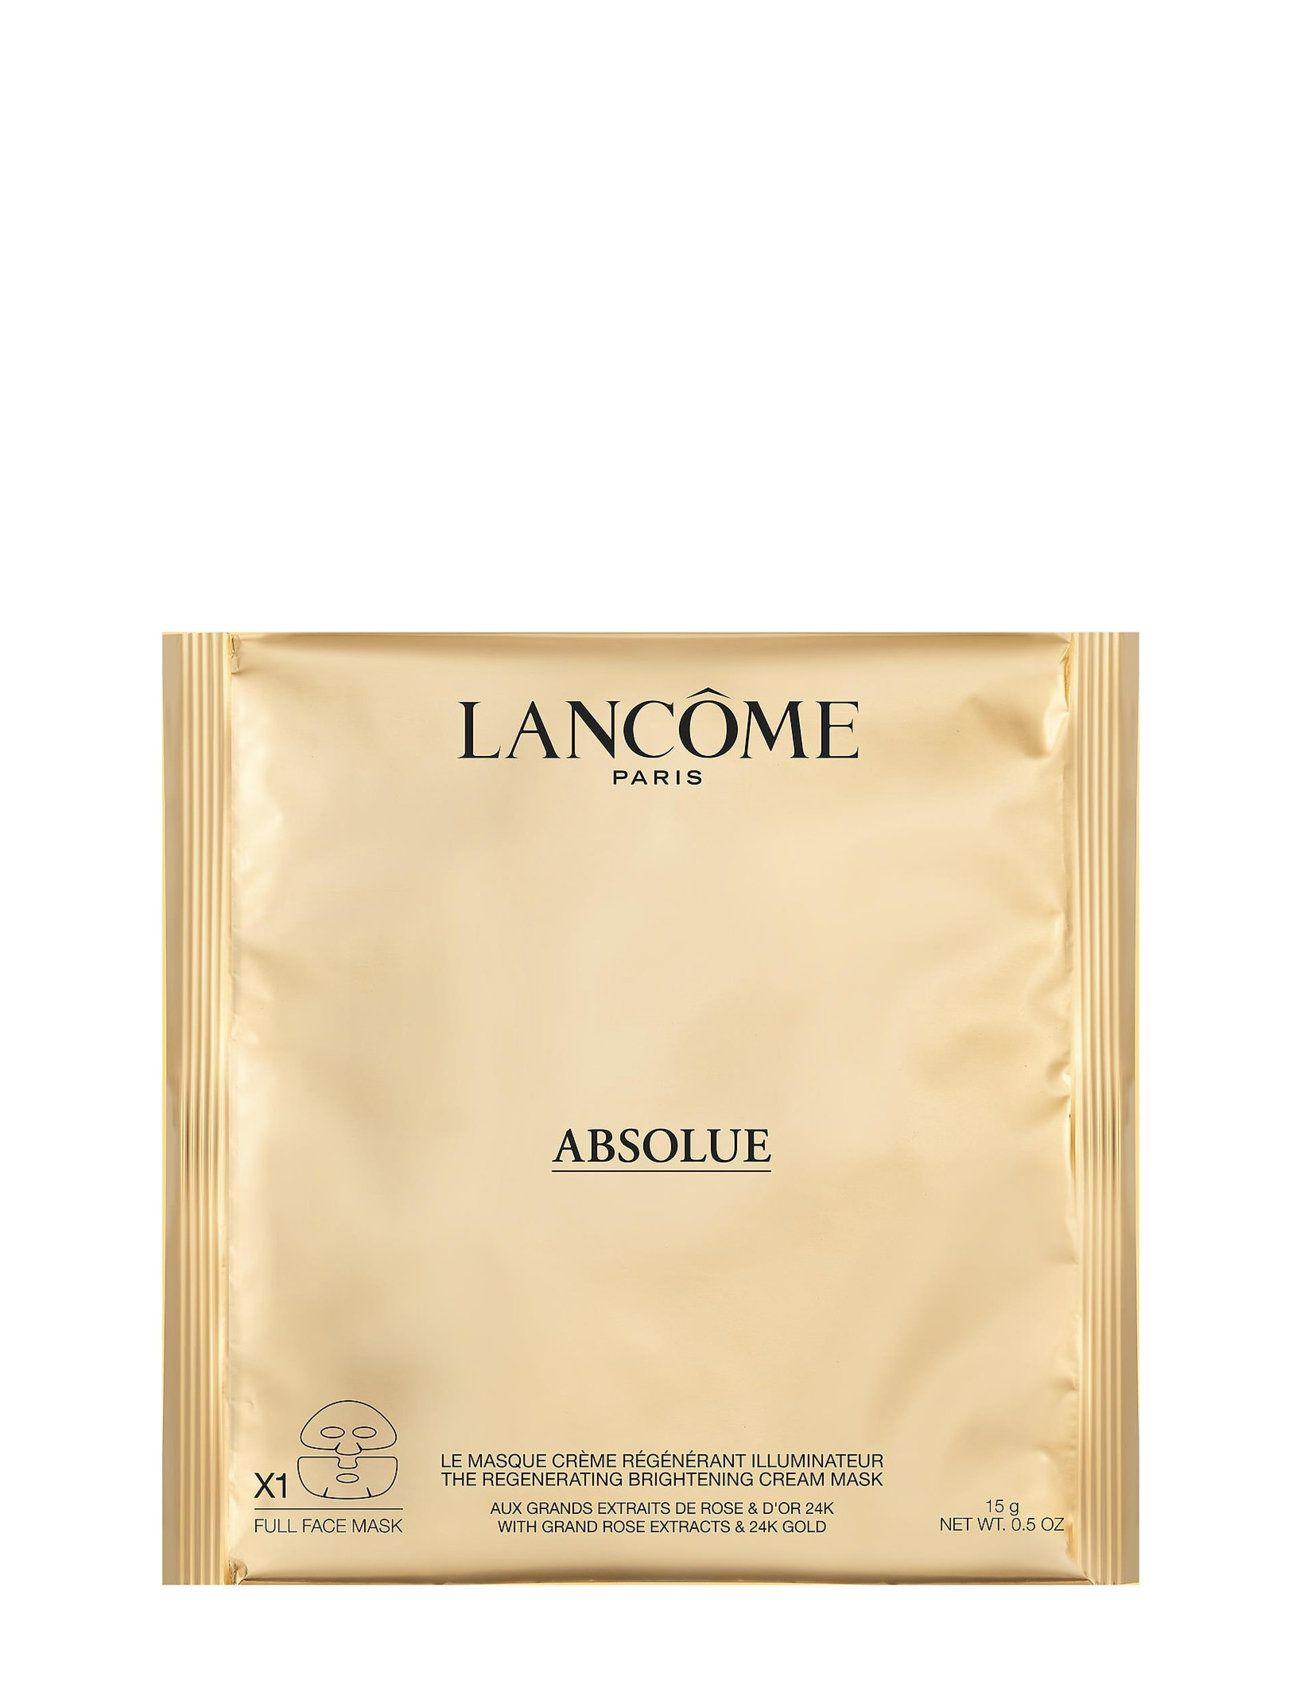 Absolue Golden Mask Beauty WOMEN Skin Care Face Sheet Mask Nude Lancôme